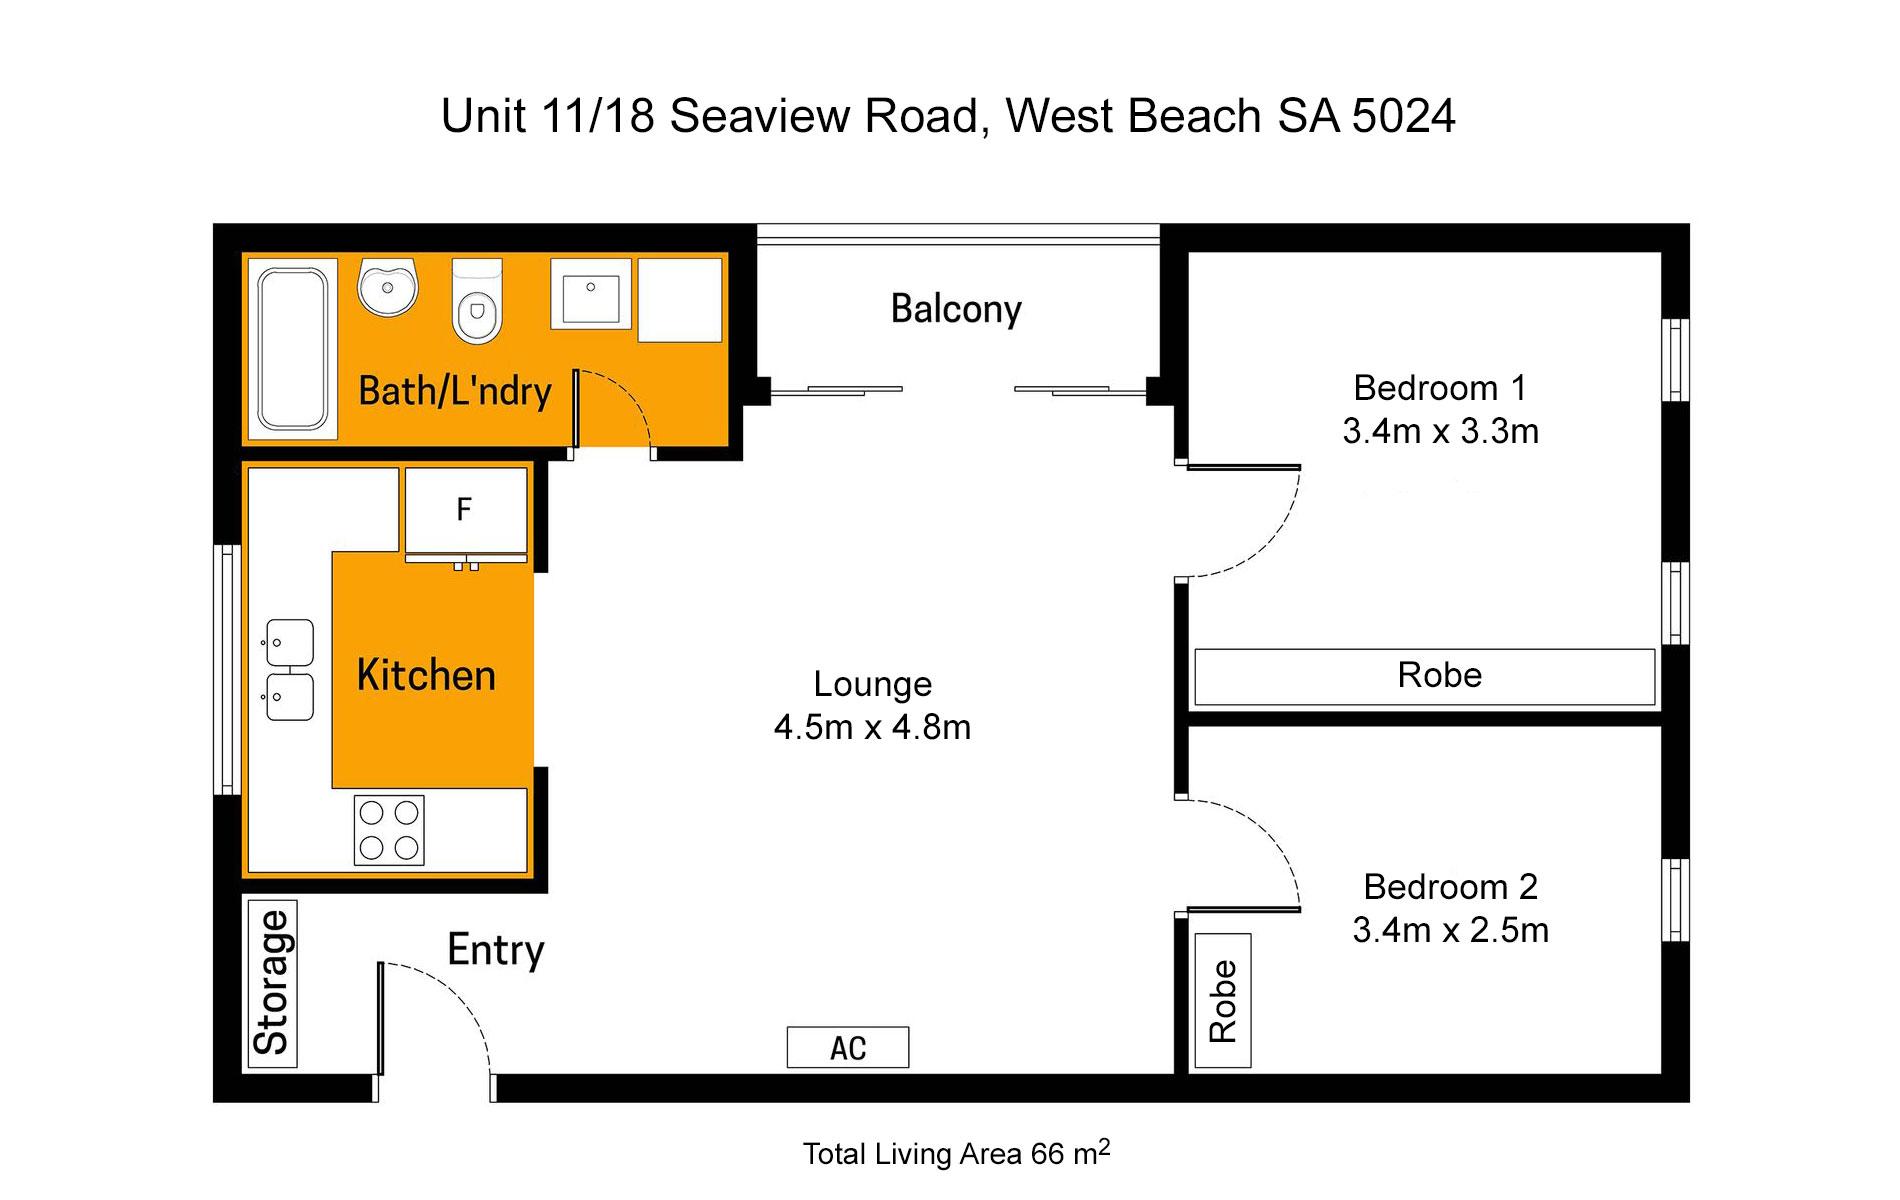 Unit 11/18 Seaview Road